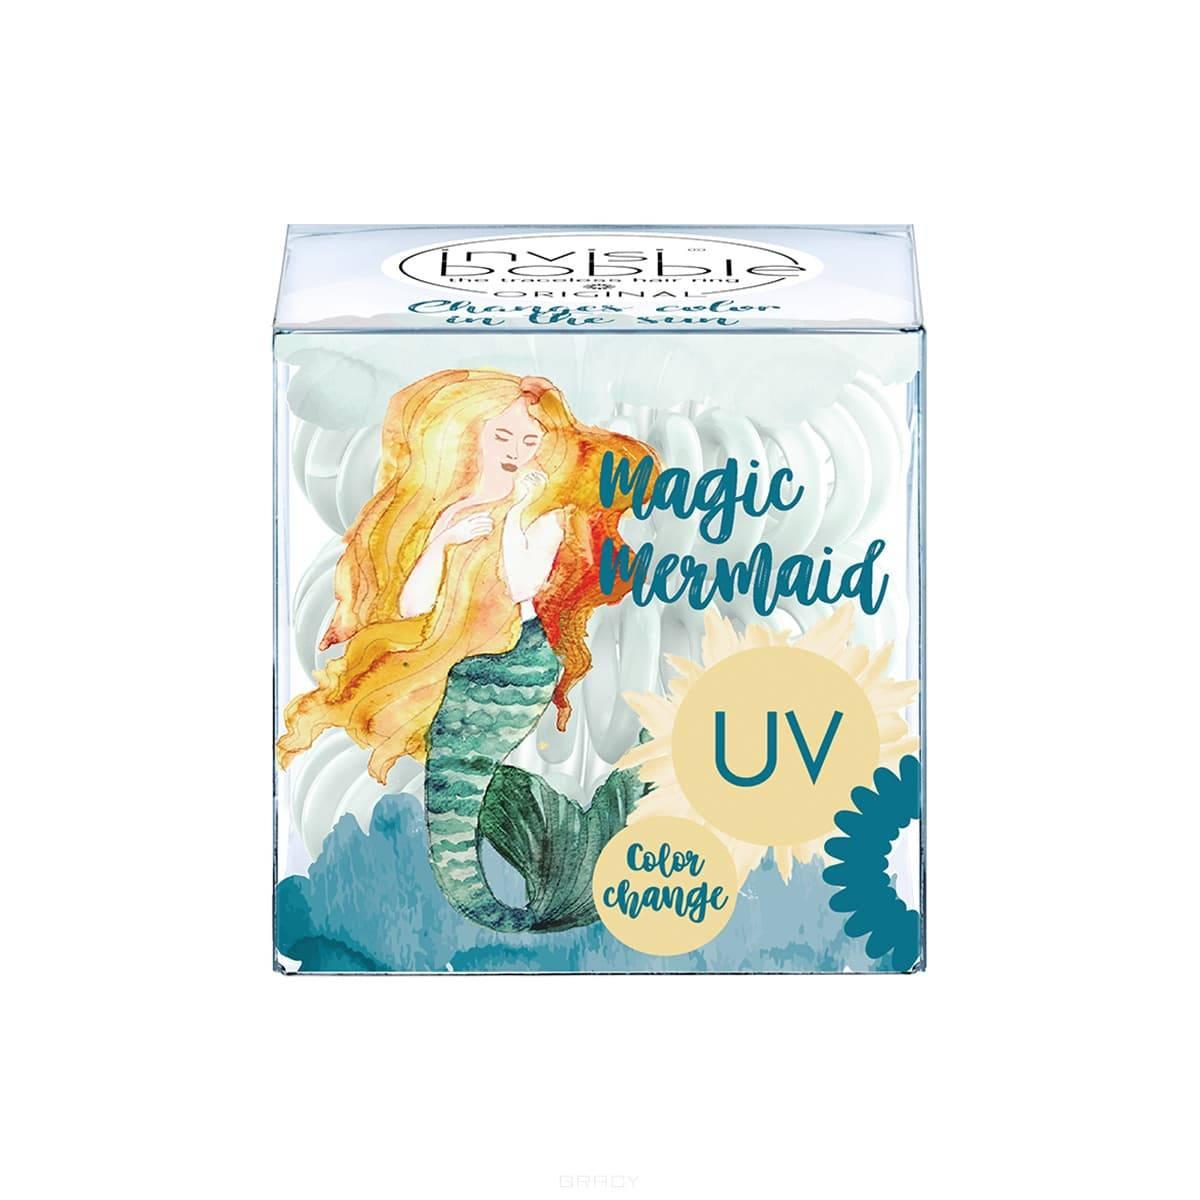 Invisibobble, Набор резинок для волос Magic Mermaid Ocean Tango, приглушенно-голубой, 3 шт/уп резинка для волос invisibobble magic mermaid ocean tango 3 штуки 3139